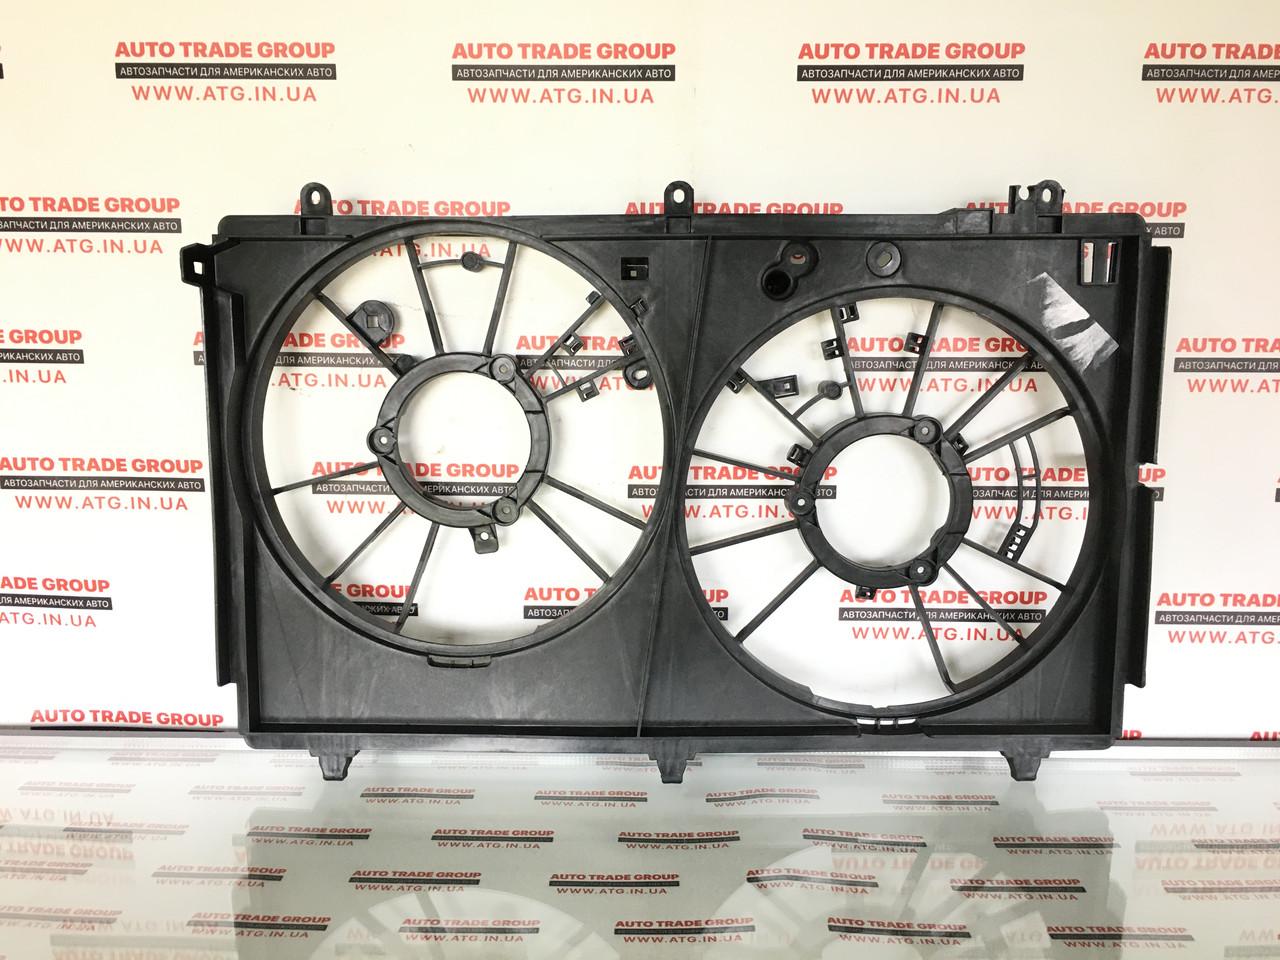 Дифузор радіатора 2.0 2 вентилятора OUTLANDER 2016 1355A258